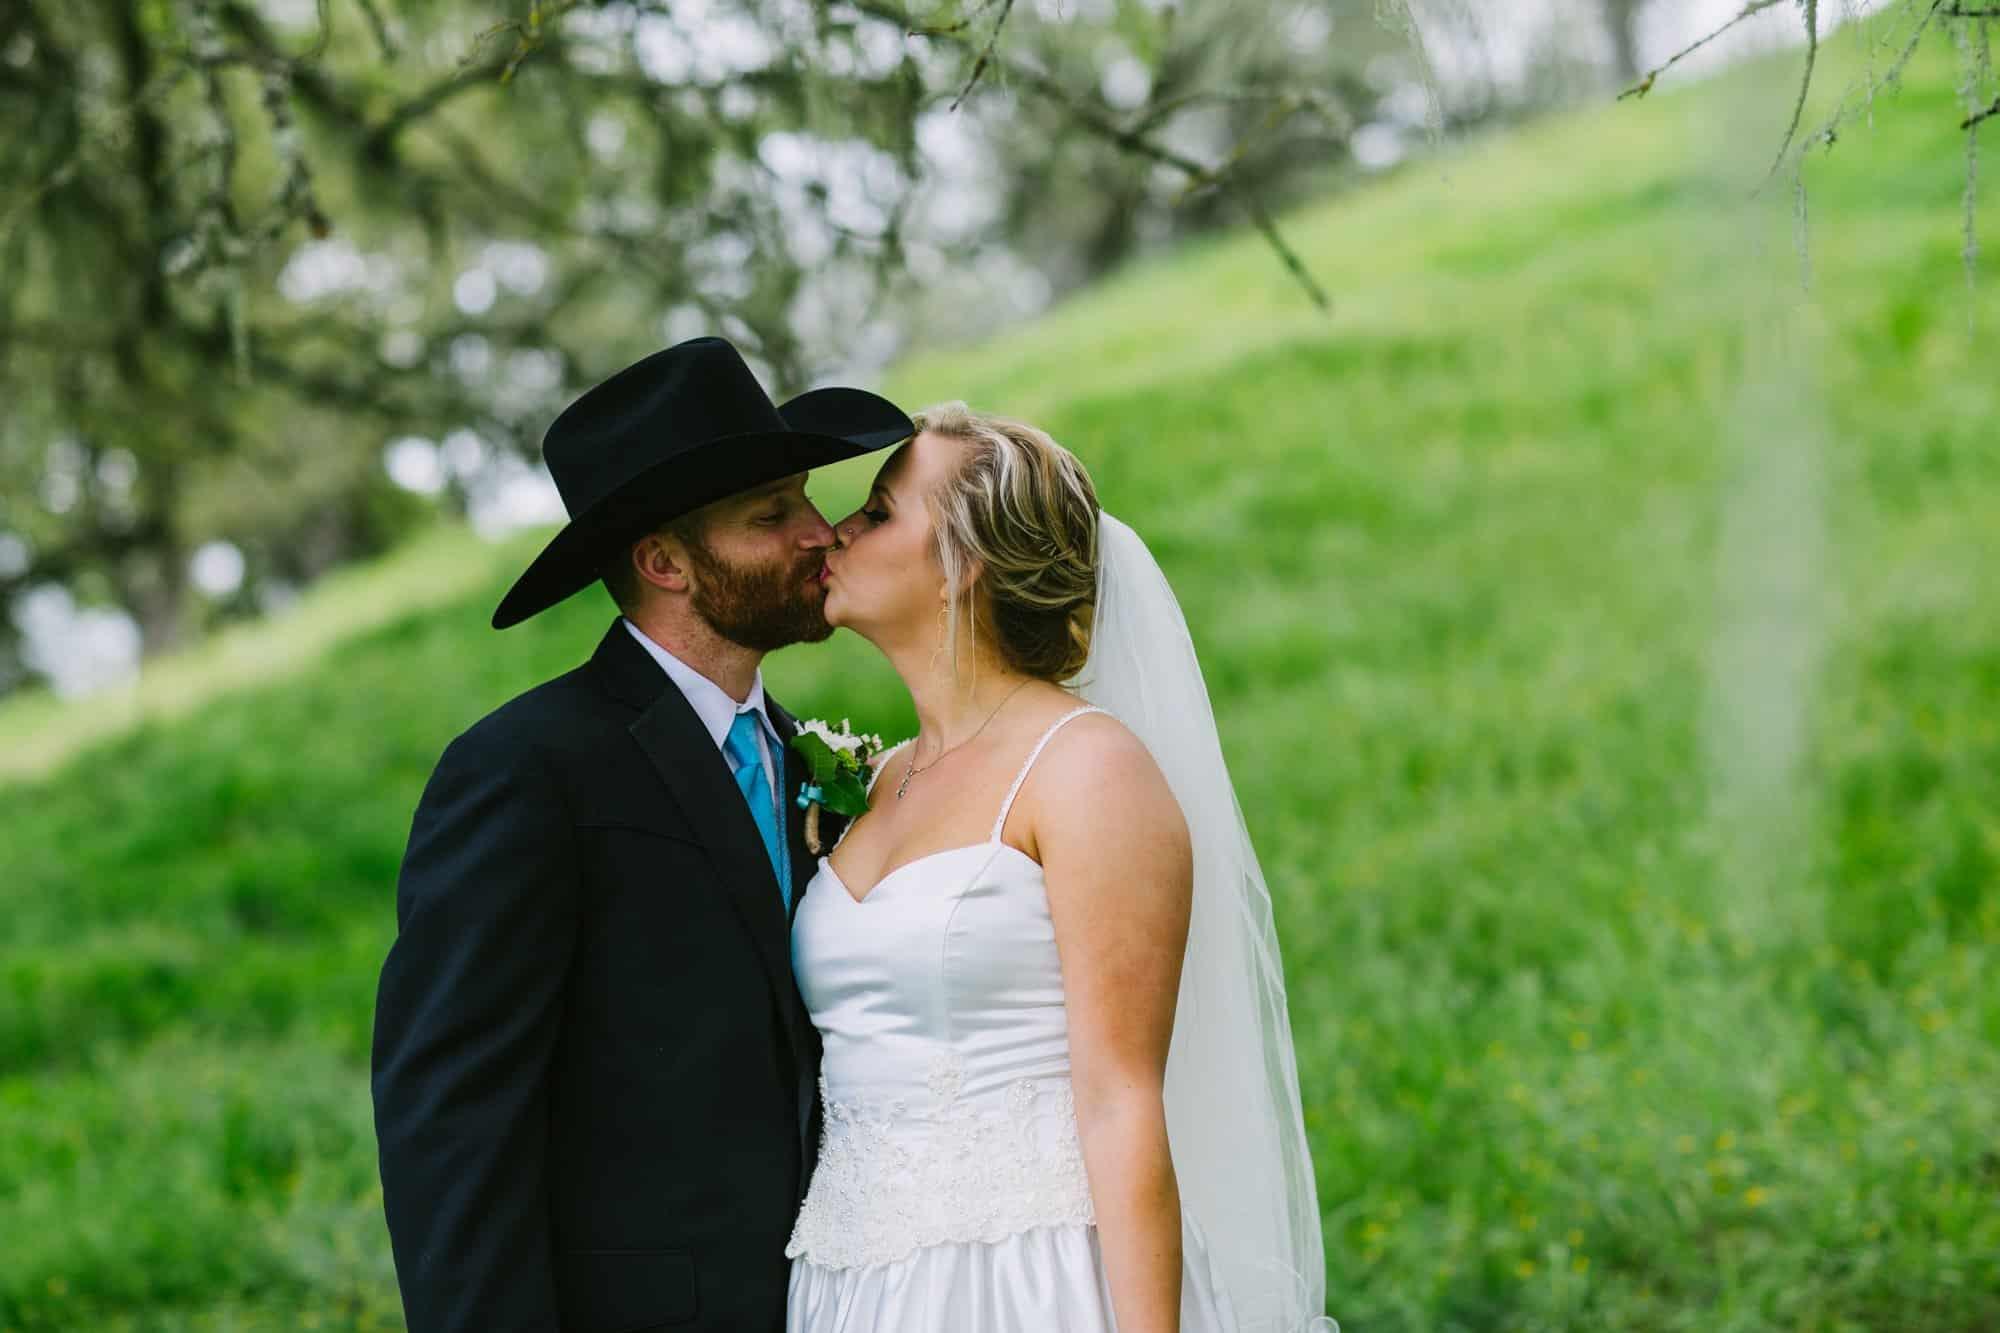 seitz_paso_robles_wedding-53